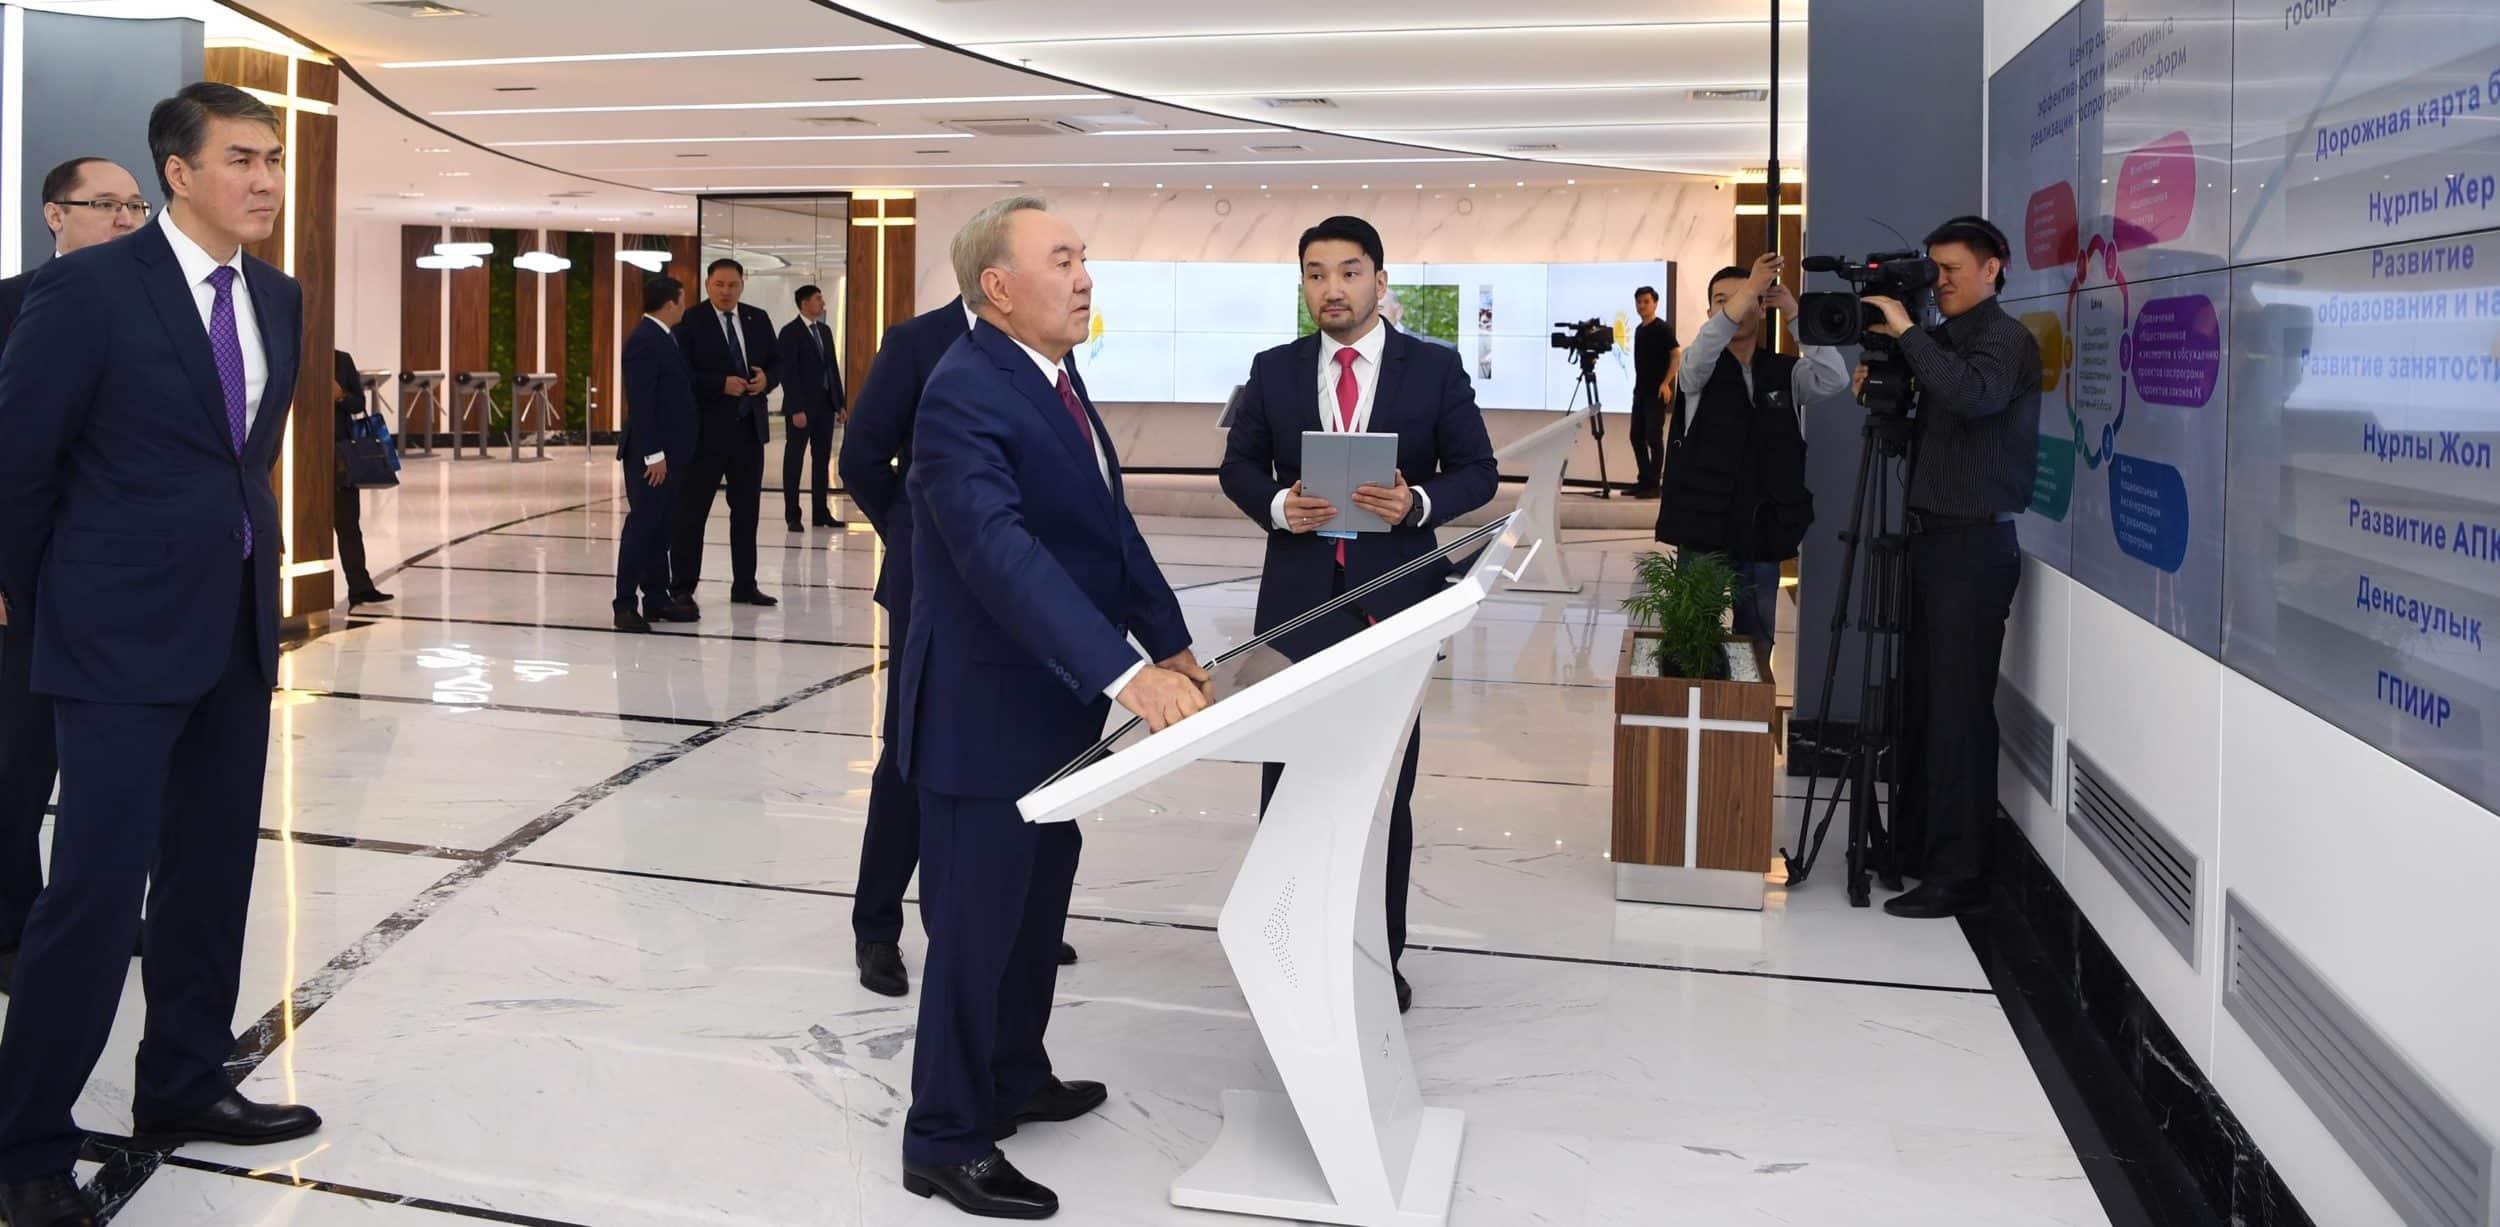 Нұрсұлтан Назарбаев Nur Otan партиясы орталық аппаратында